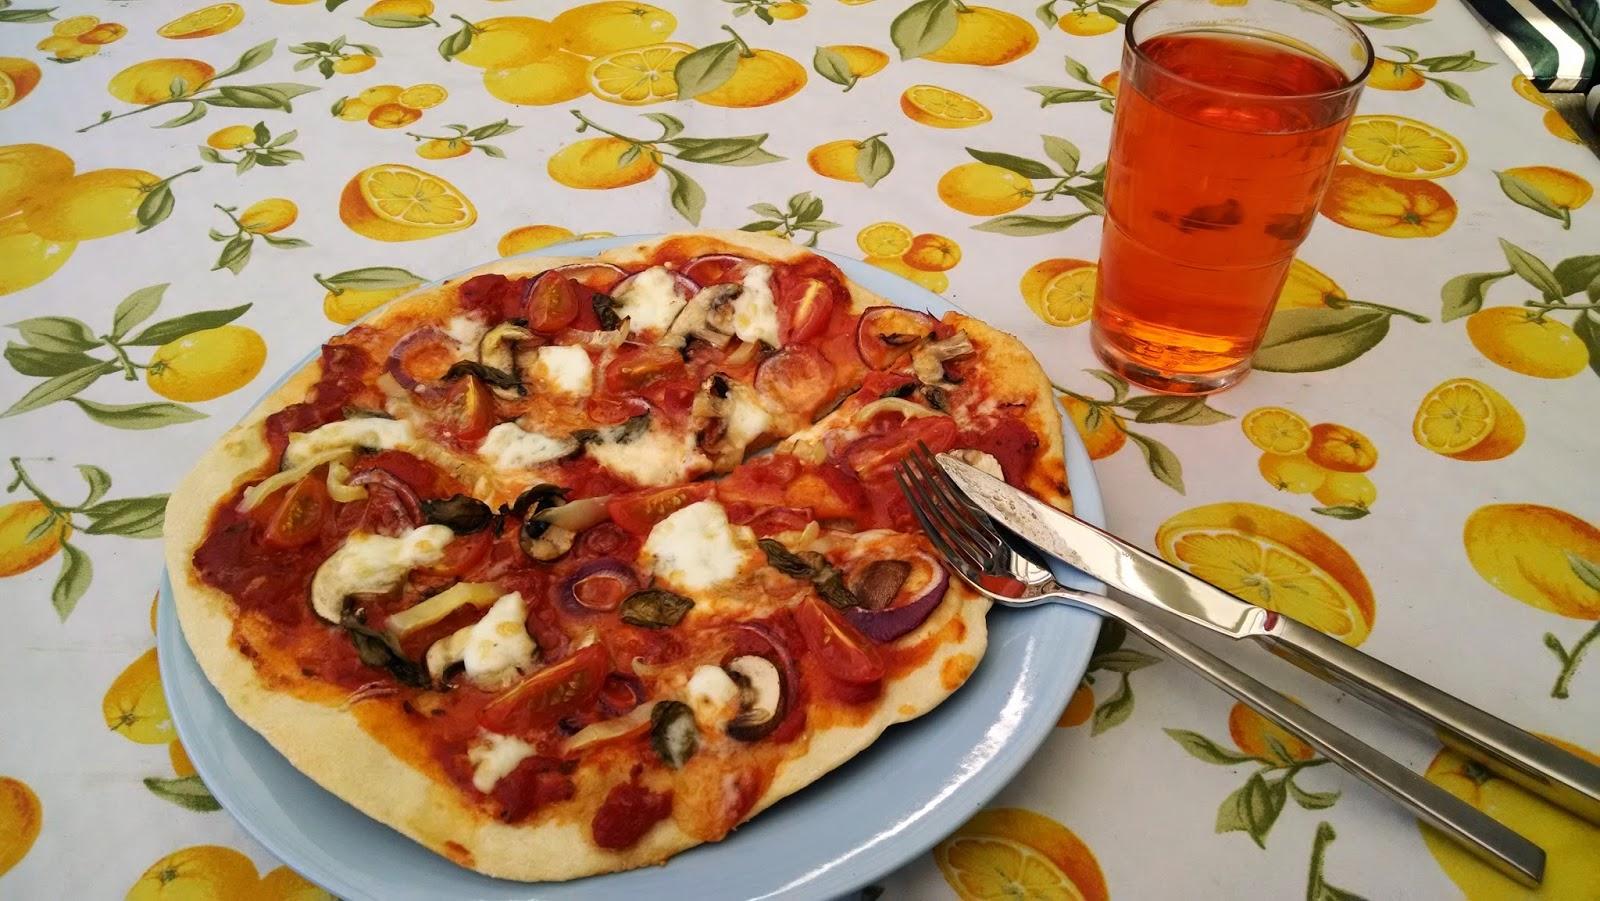 http://eatdrinksewthink.blogspot.de/2014/09/echt-italienische-pizza-real-italian.html